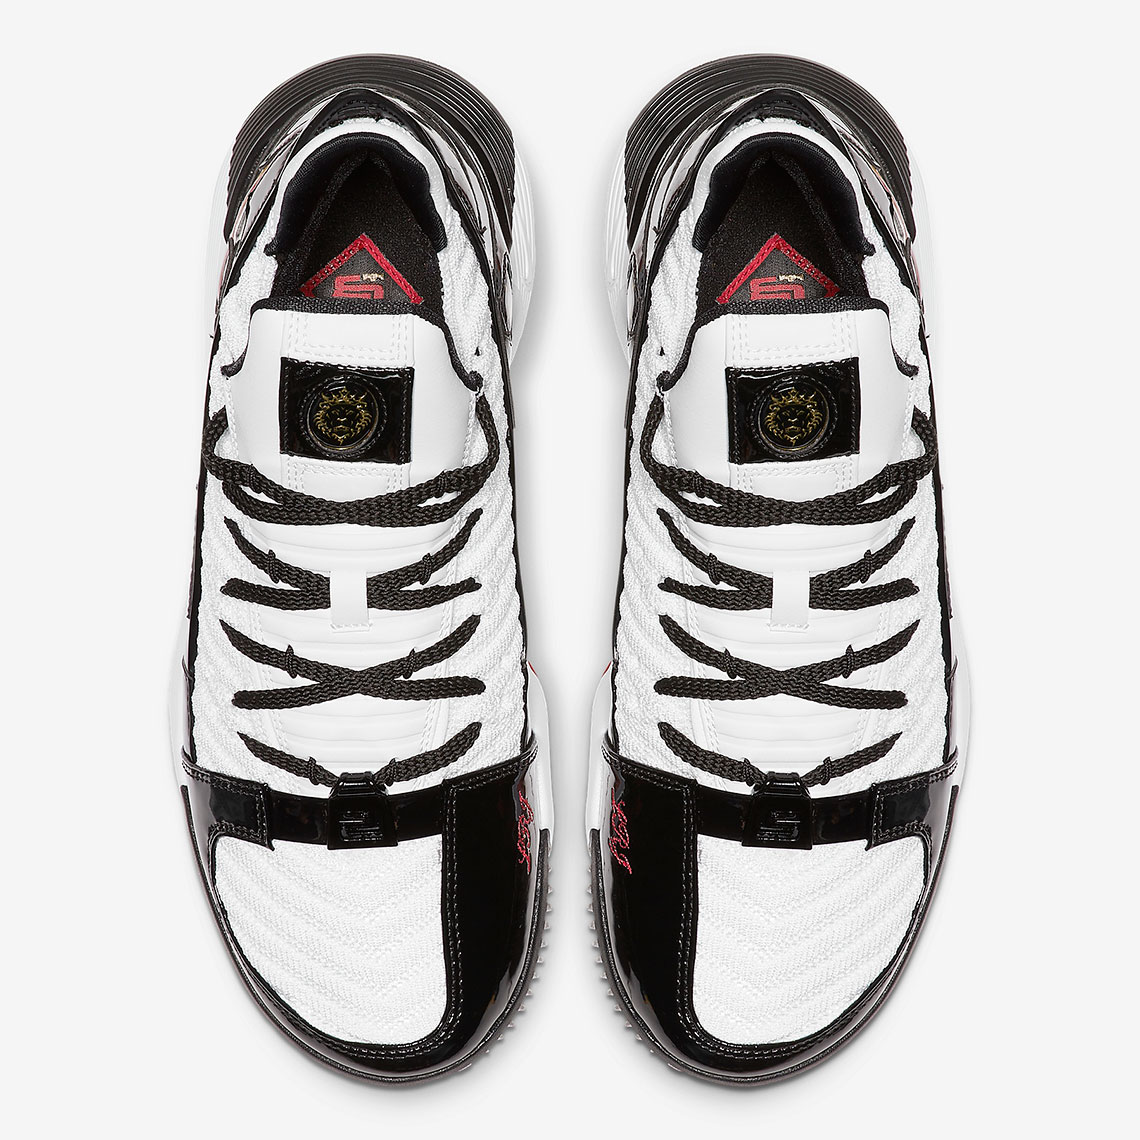 84a1f388274b Nike LeBron 16 Remix LeBron Watch CD2451-101